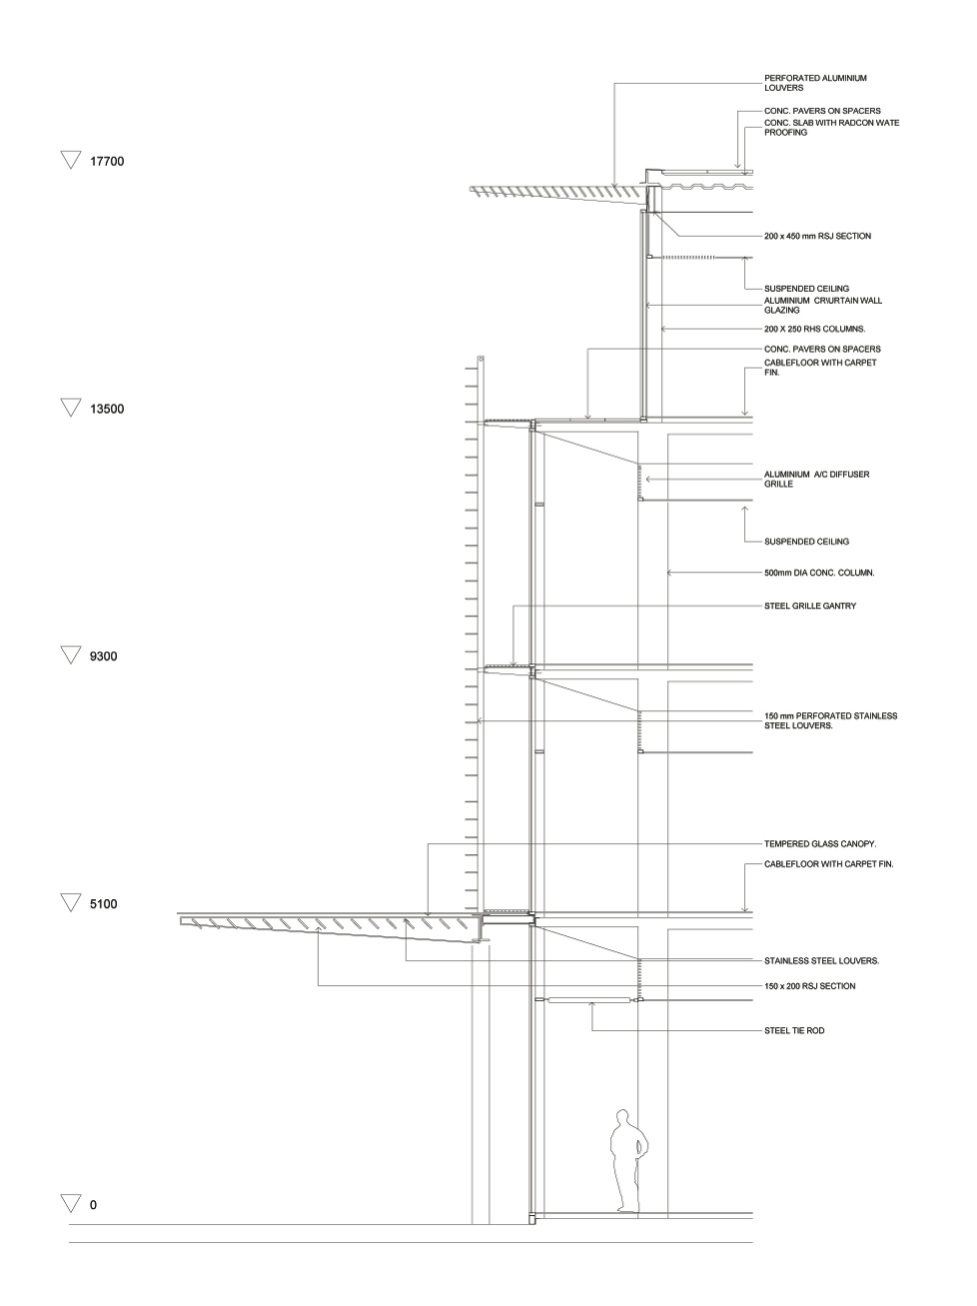 façade section